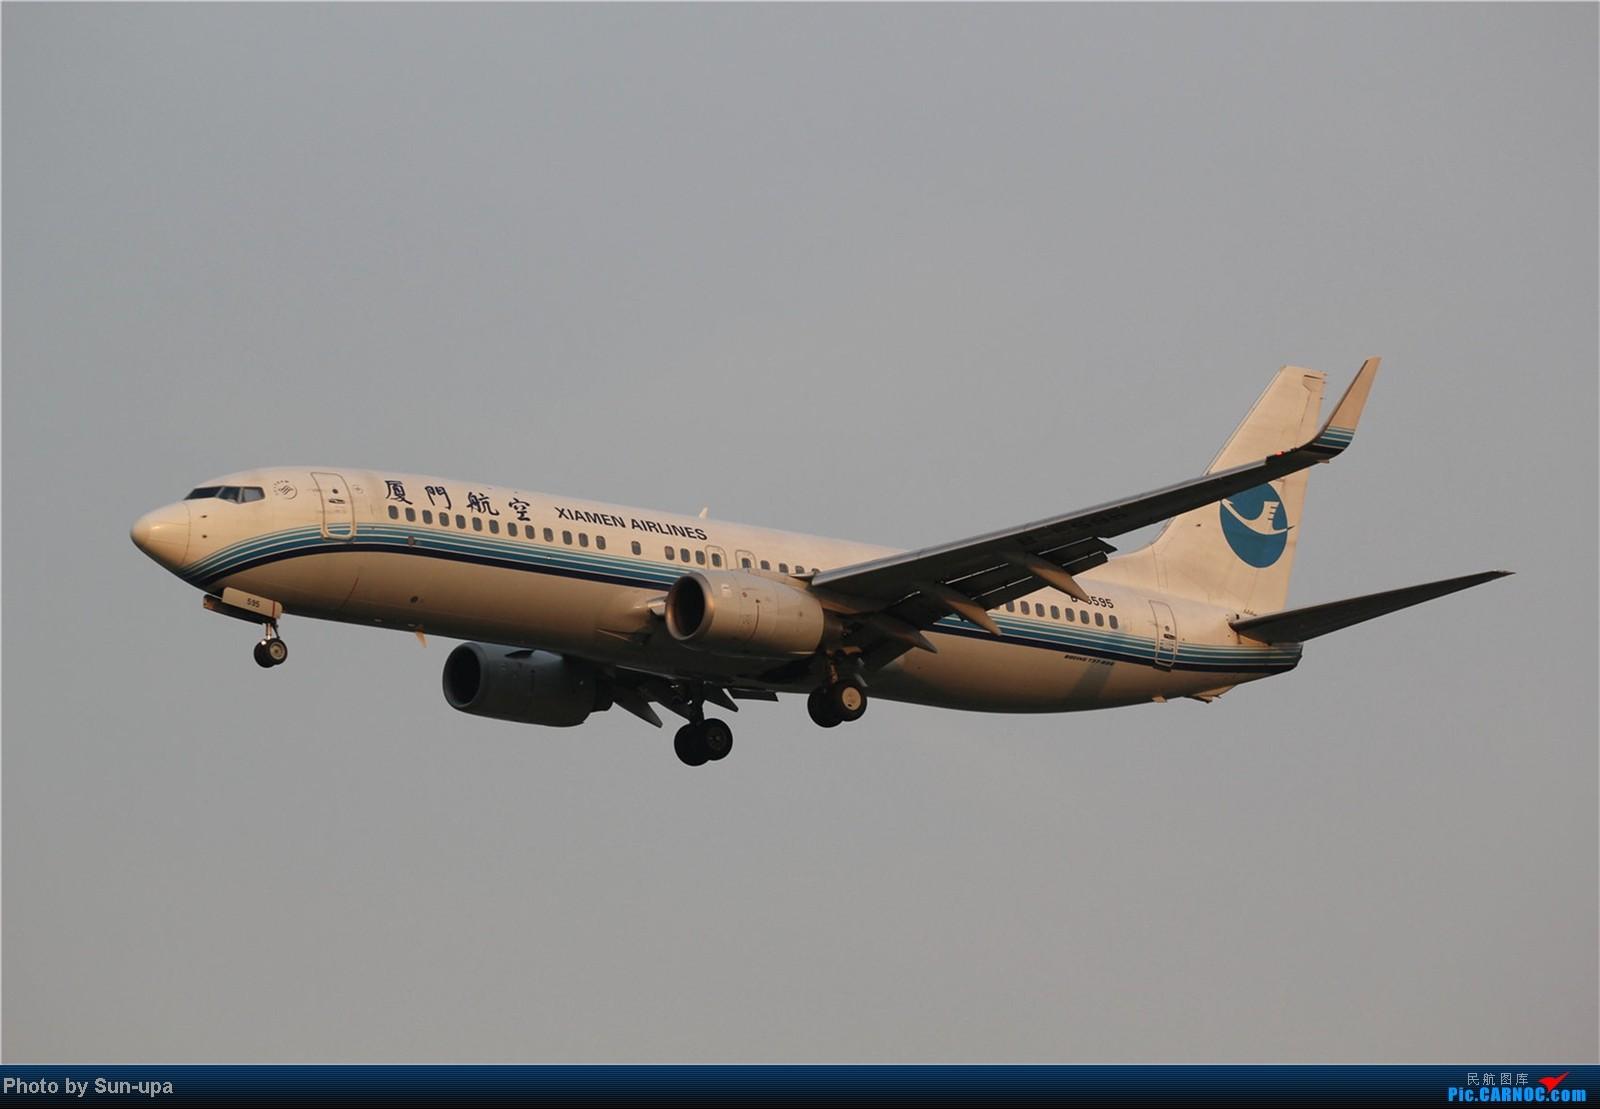 Re:[原创]【Sun-upa】老图新发 前段时间pek杂图+11.7机场内随拍 BOEING 737-800 B-5595 中国北京首都机场